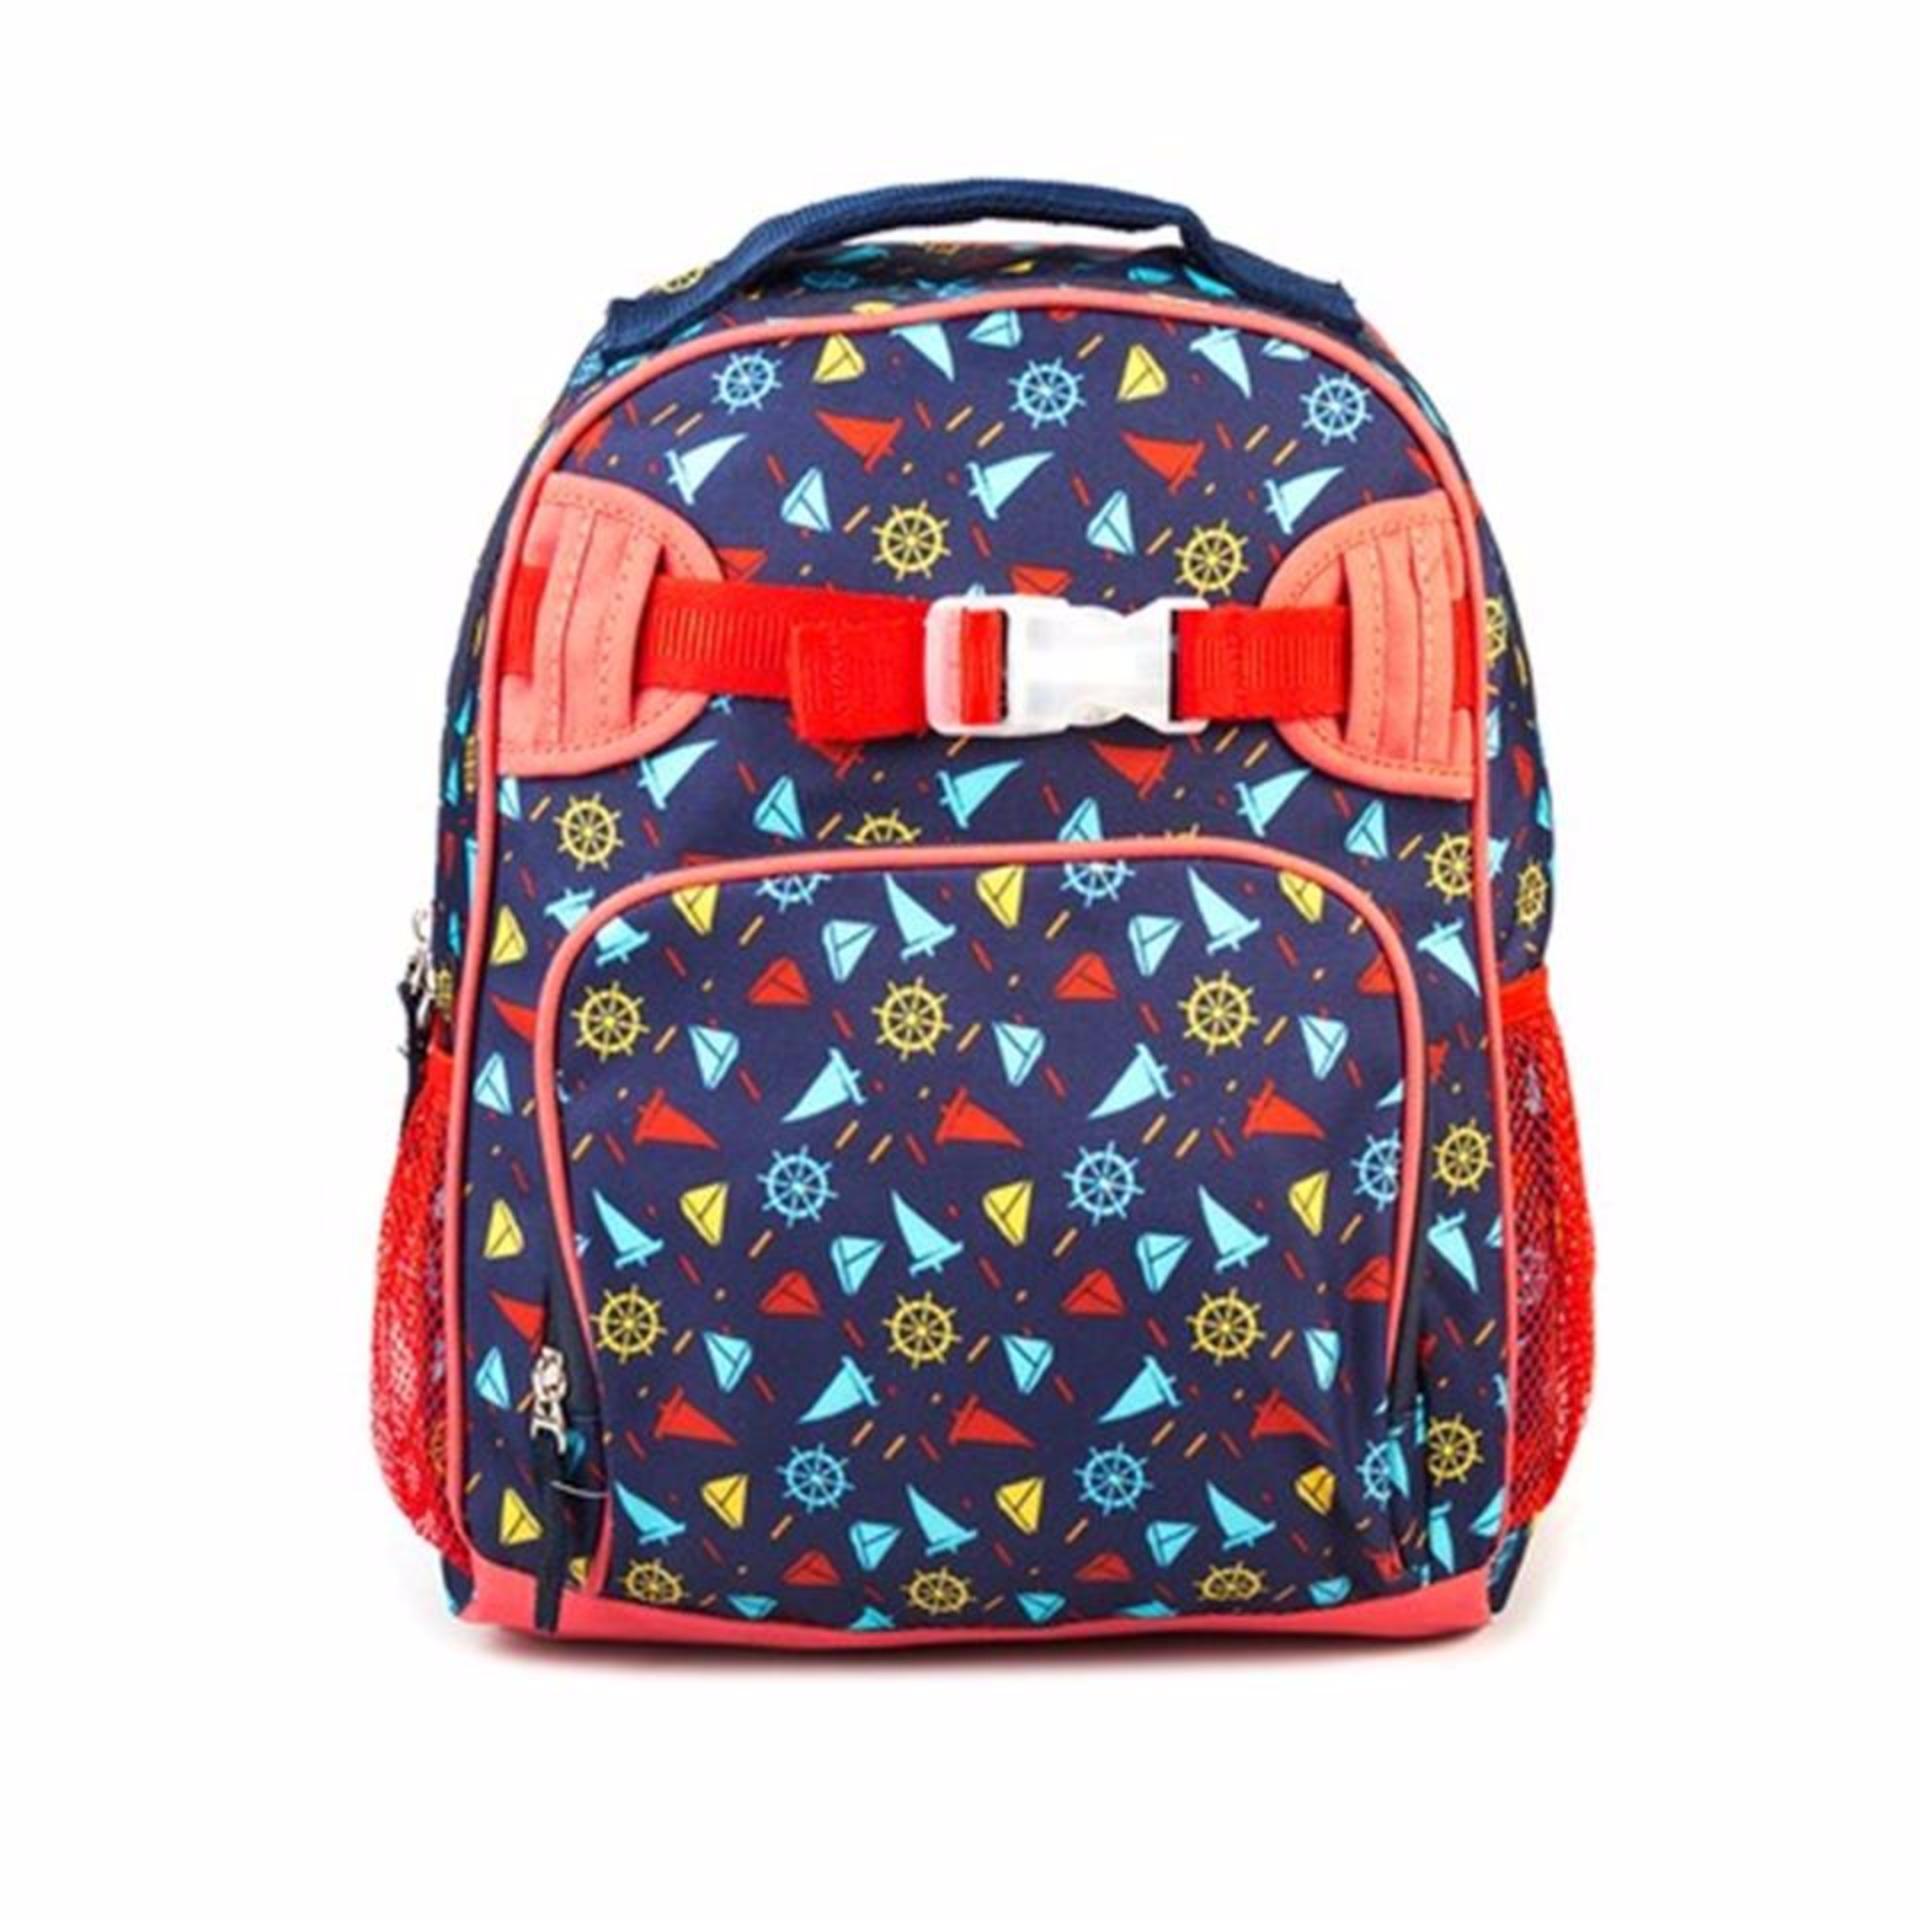 Lily and Tucker Sailor Boy's Medium Backpack (Dark Blue) - thumbnail